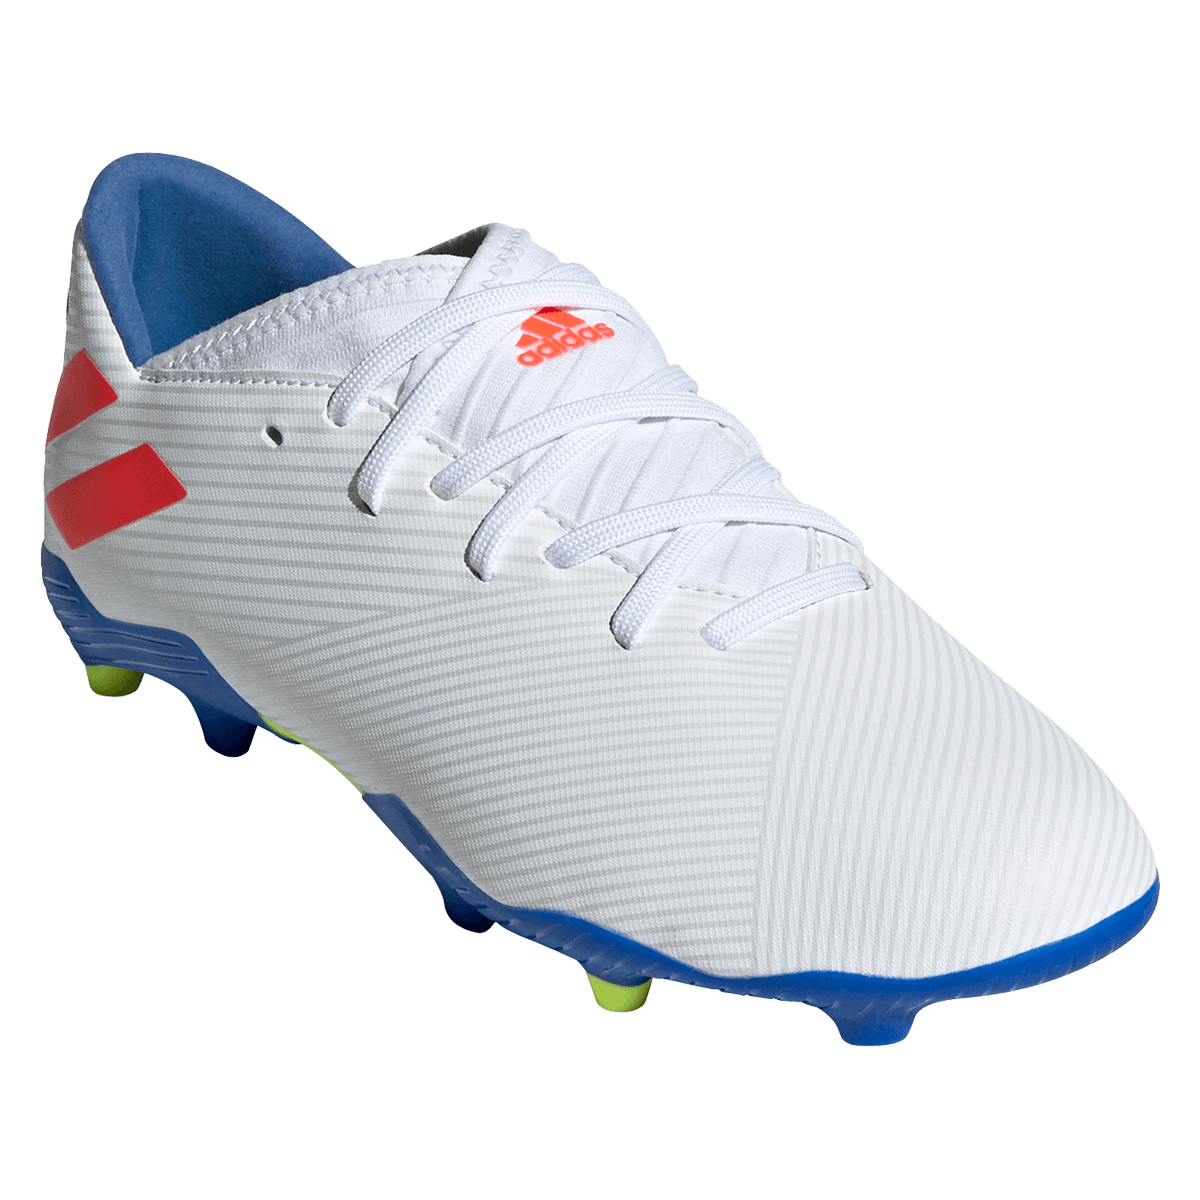 Adidas Nemeziz Messi 19.3 Fußballschuhe Jungen weiß rot im